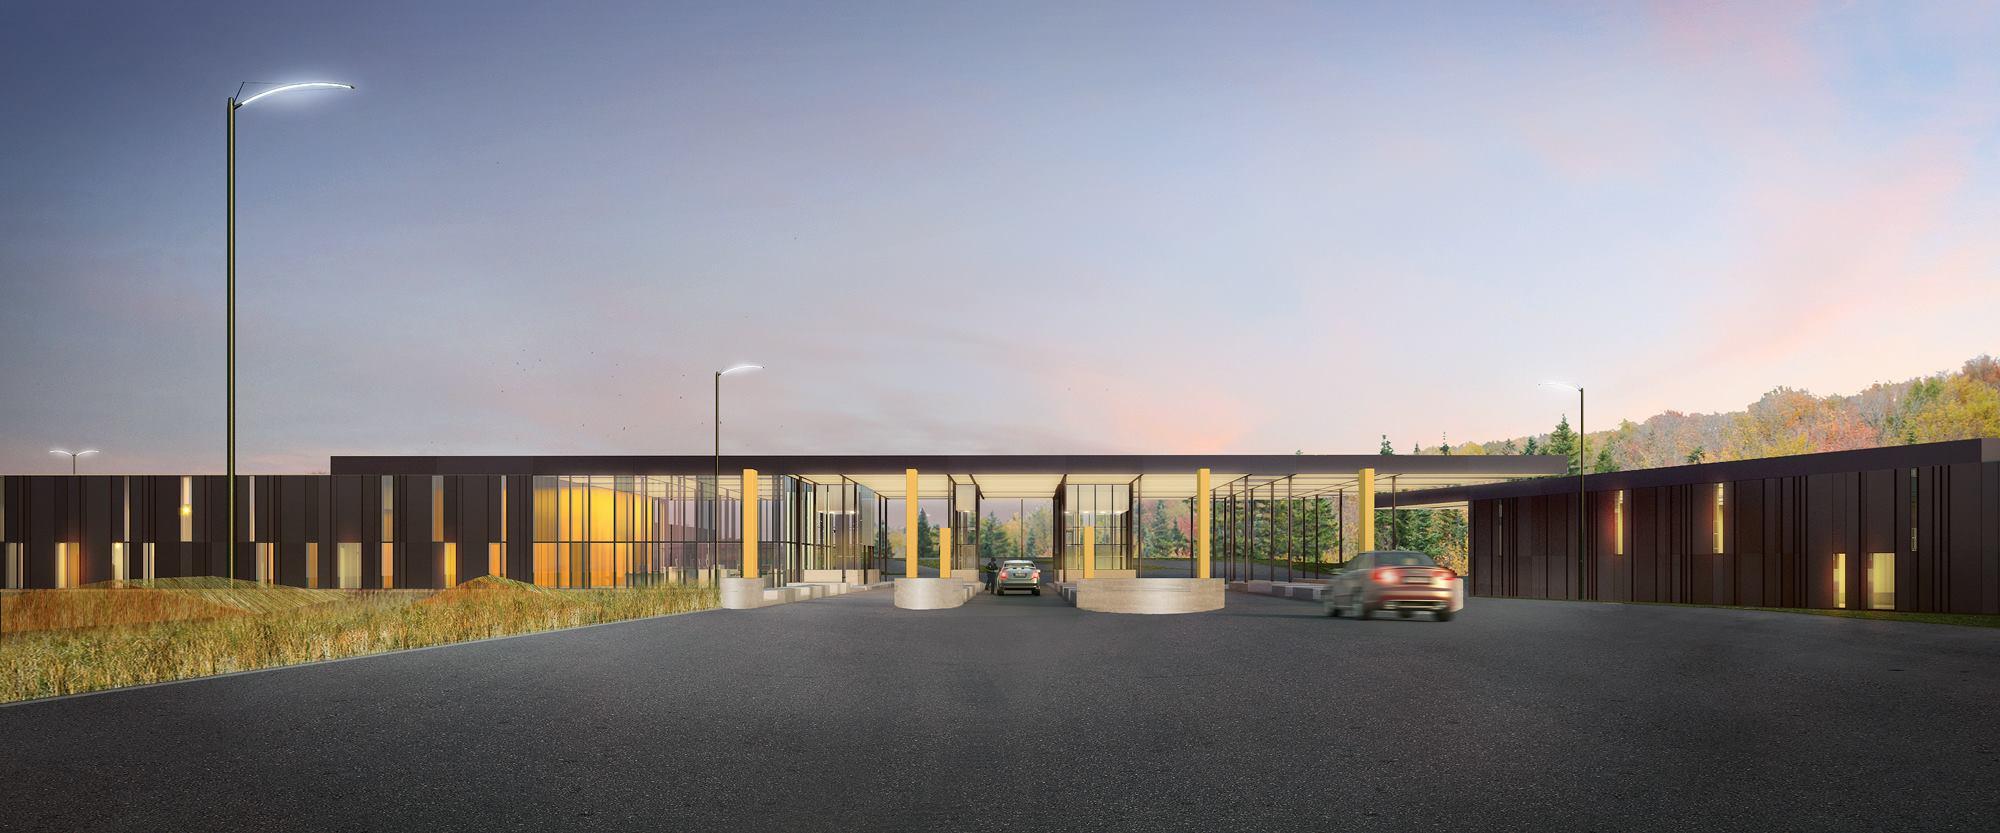 U S Land Port Of Entry Van Buren Maine Architect Magazine